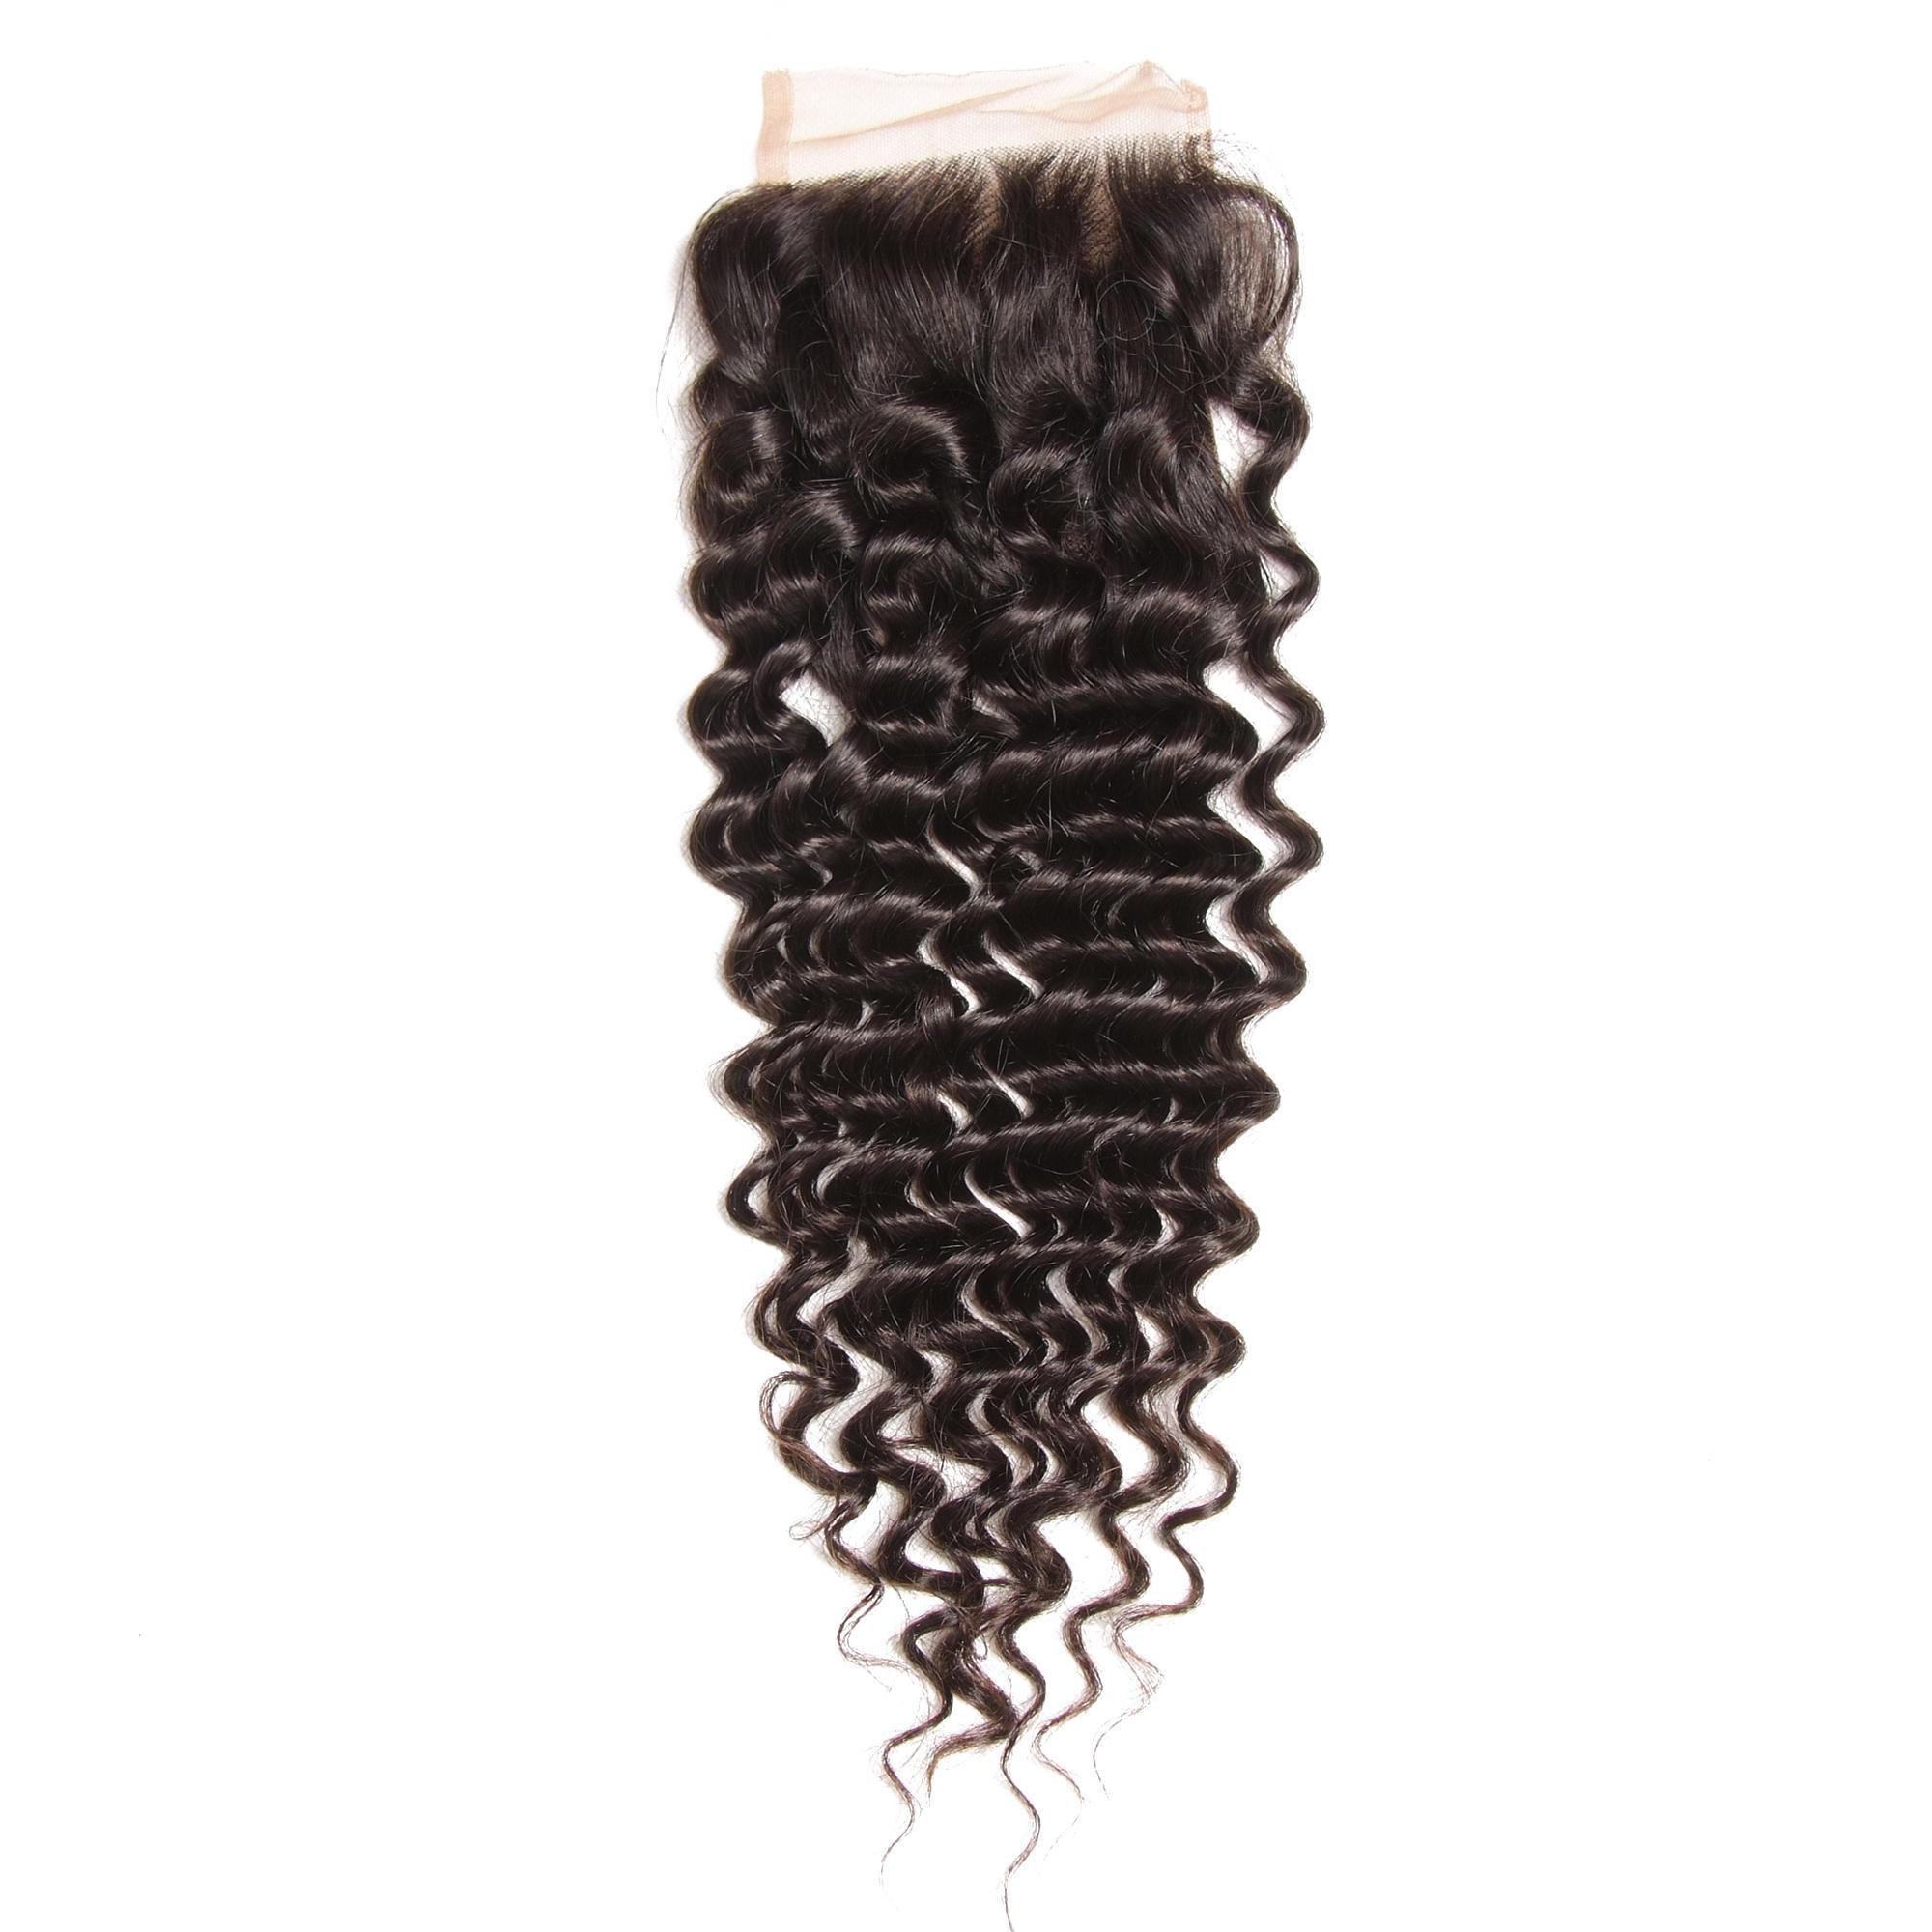 UNice Hair image 31